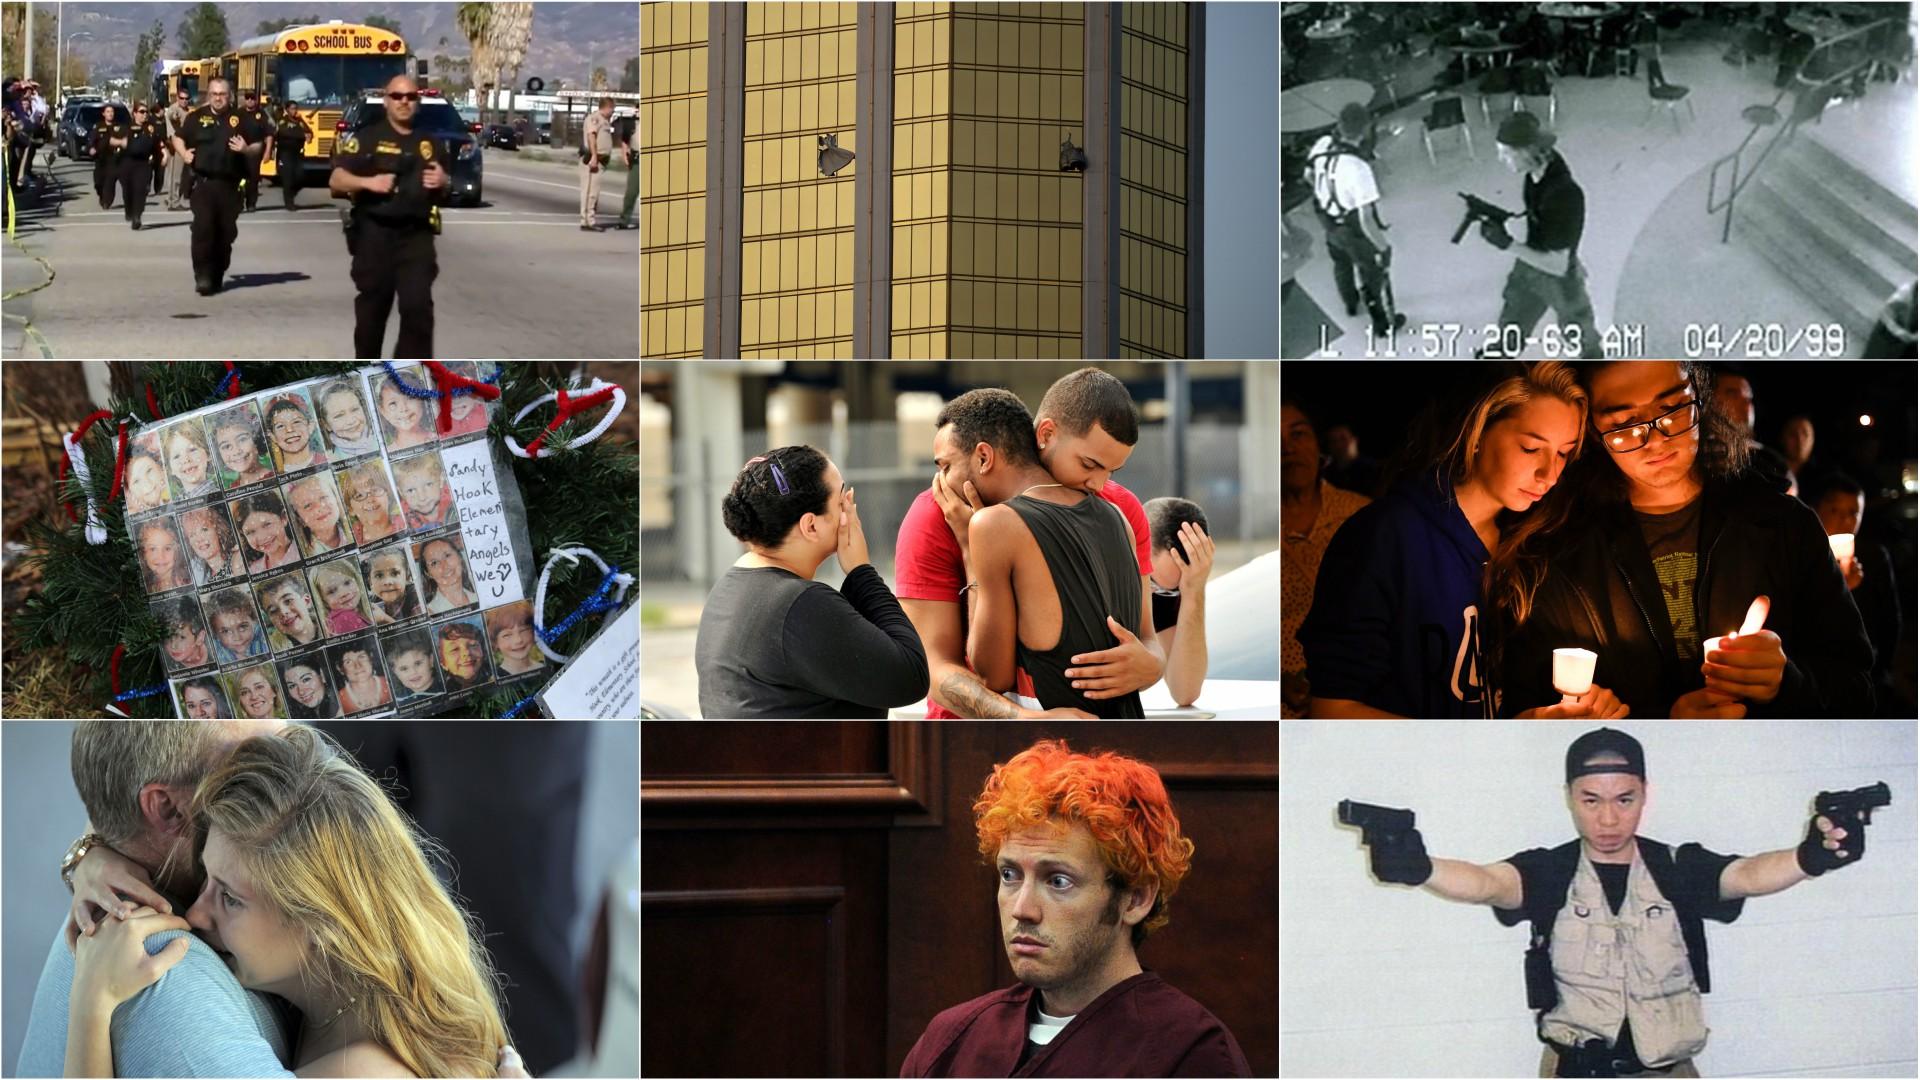 El Estado debe tomar medidas ante tiroteos masivos en E.E.U.U